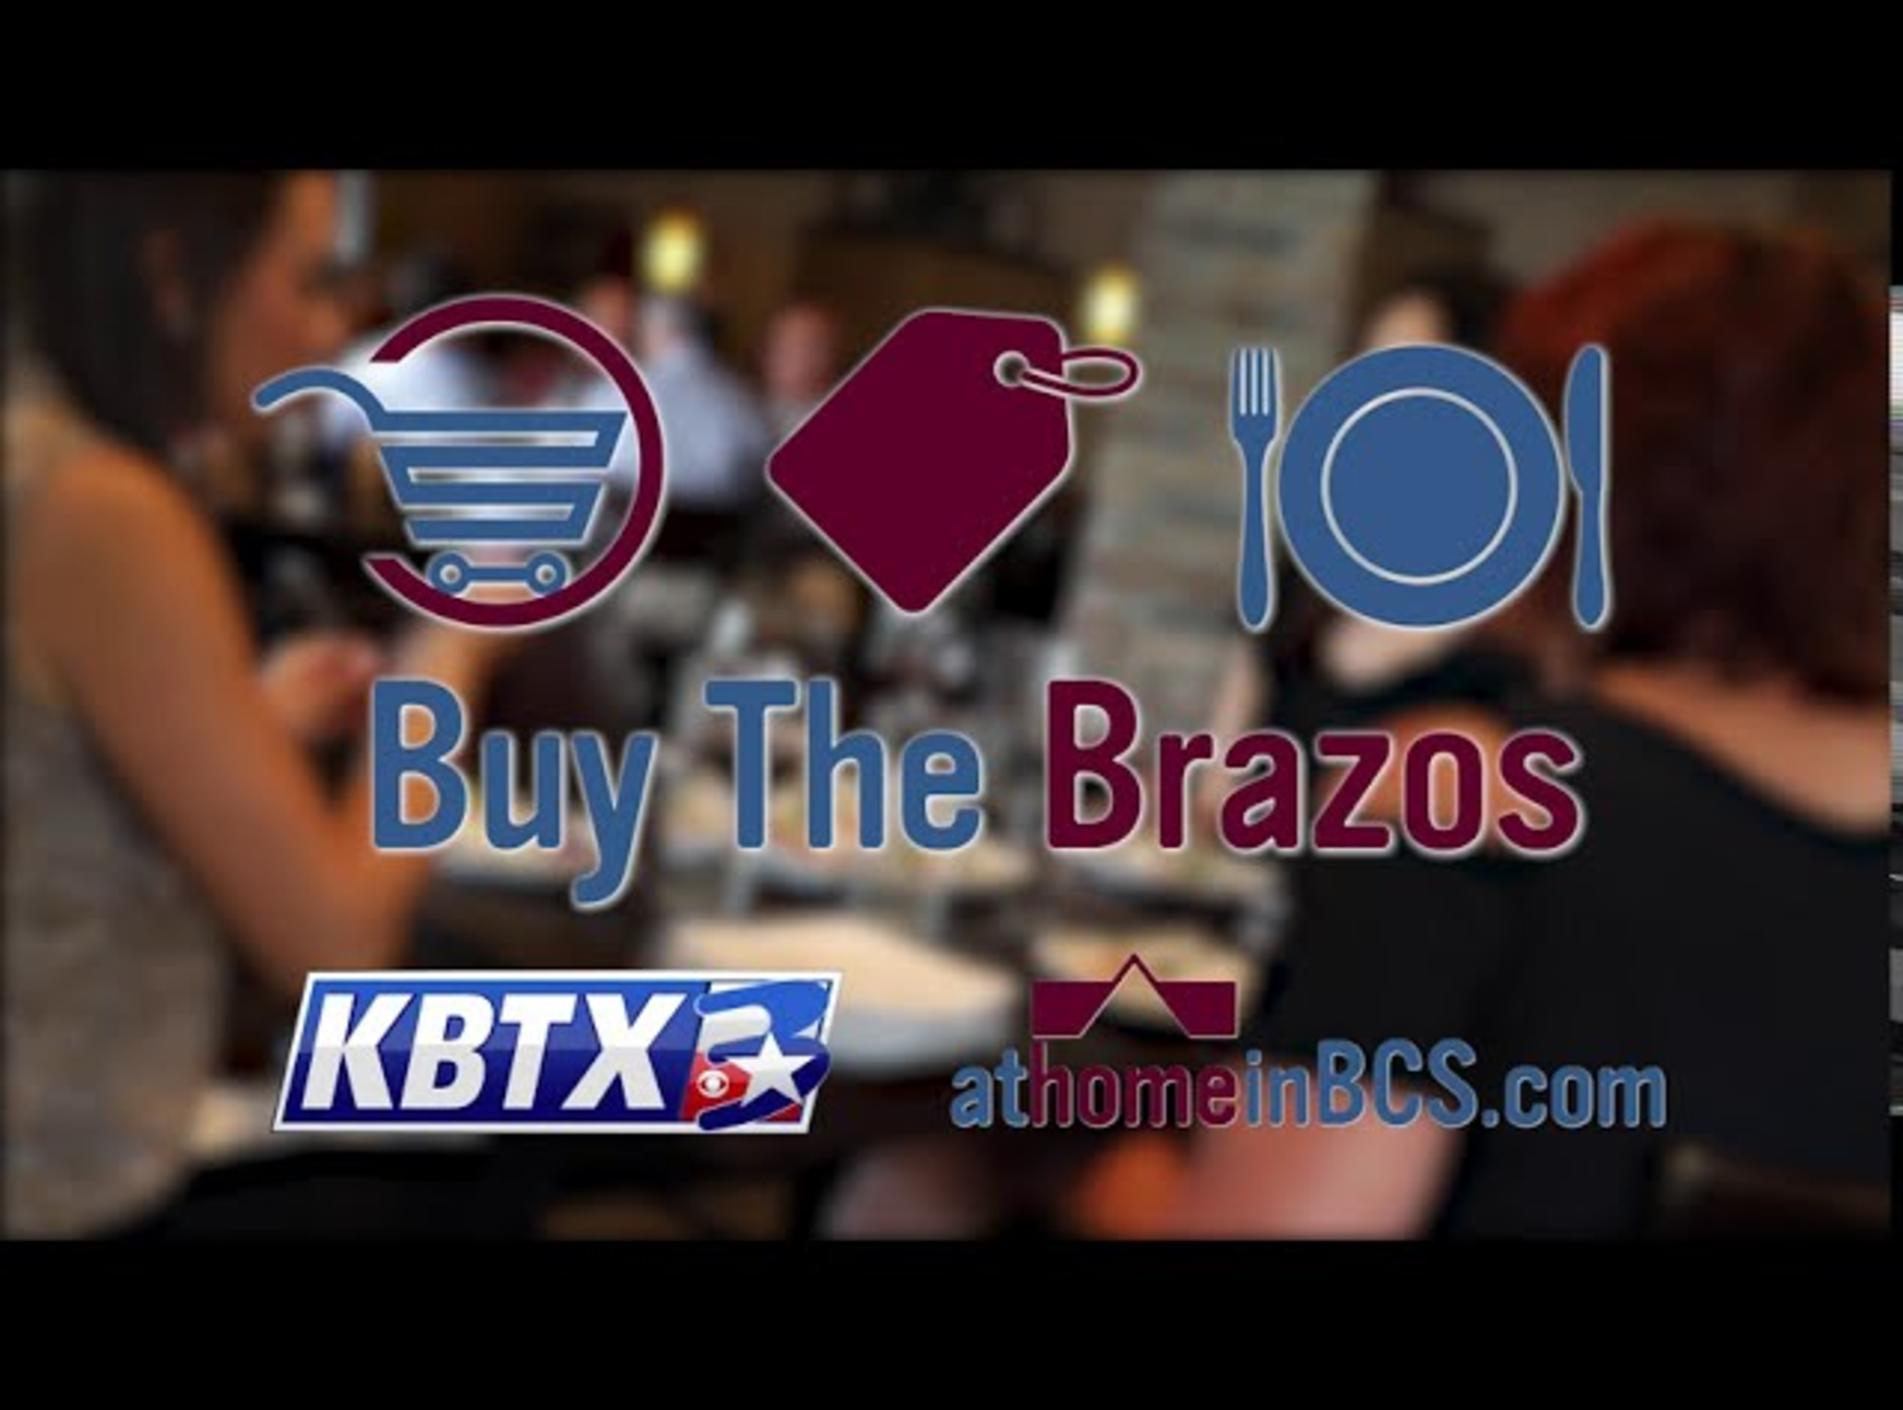 Buy the Brazos